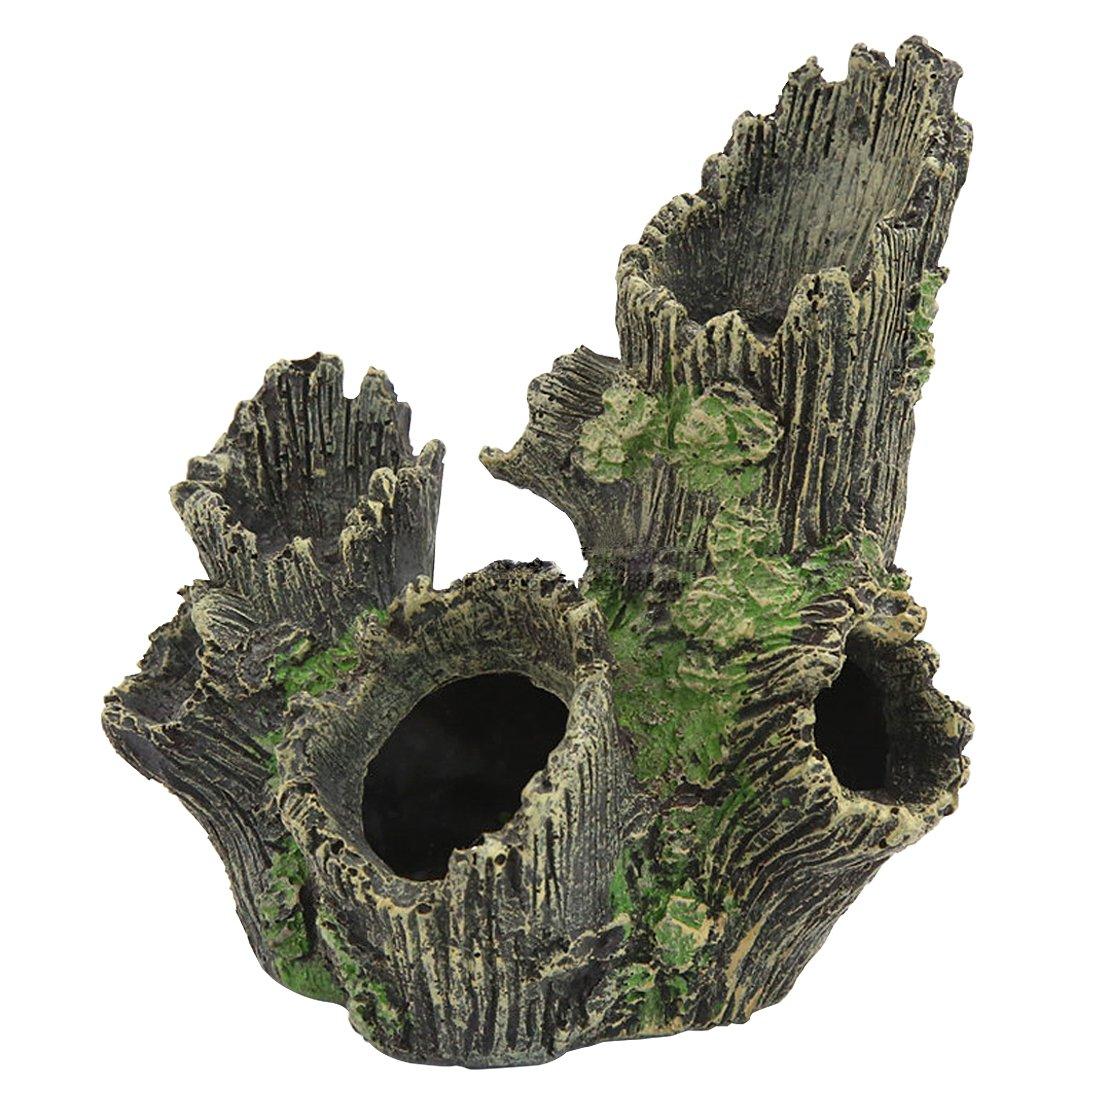 Petforu Reptile Hideouts, Tree Hole Pet Habitat Décor Hide Cave Aquarium Décor Ornaments